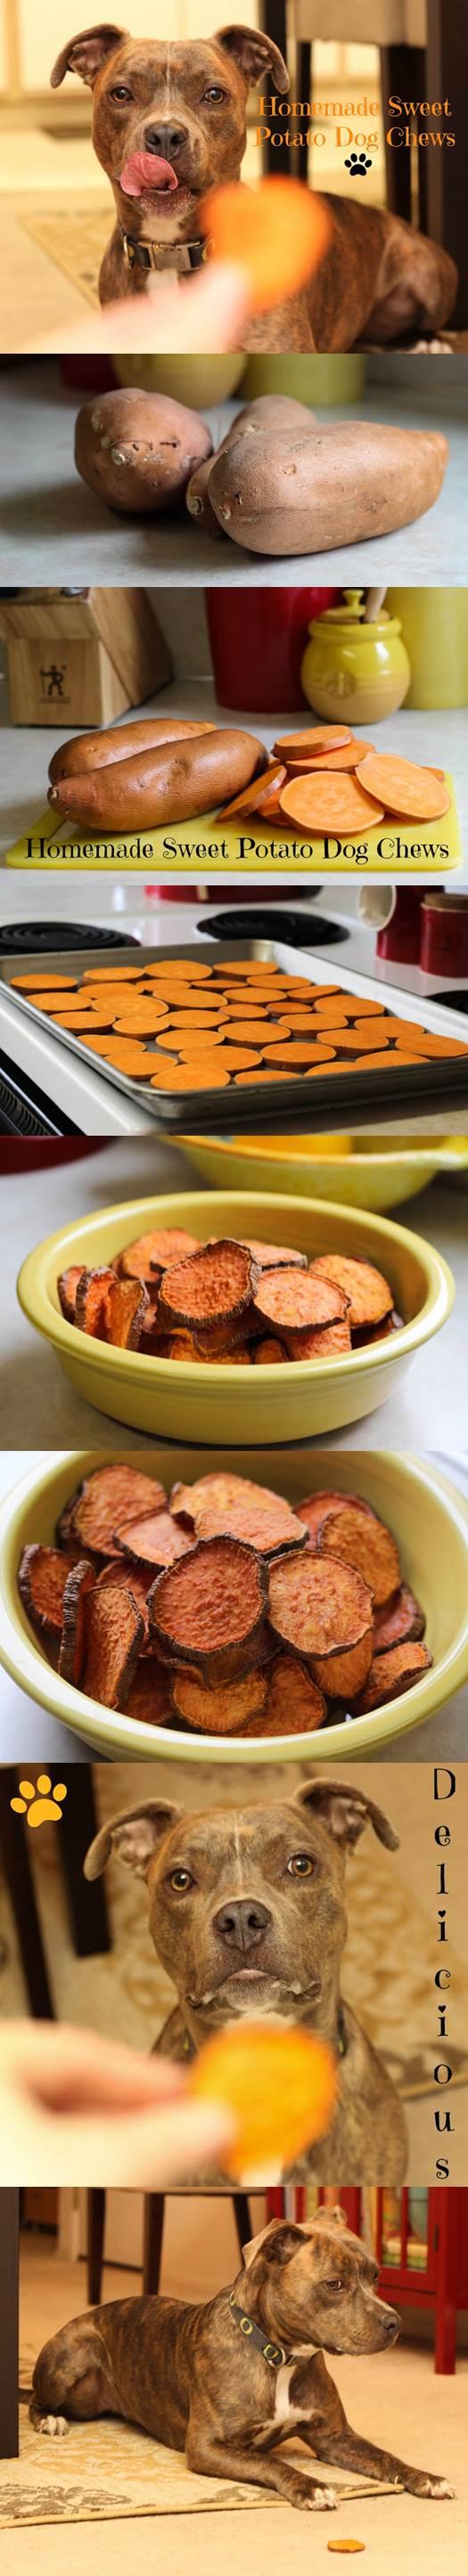 DIY Sweet Potato Dog Chews 2